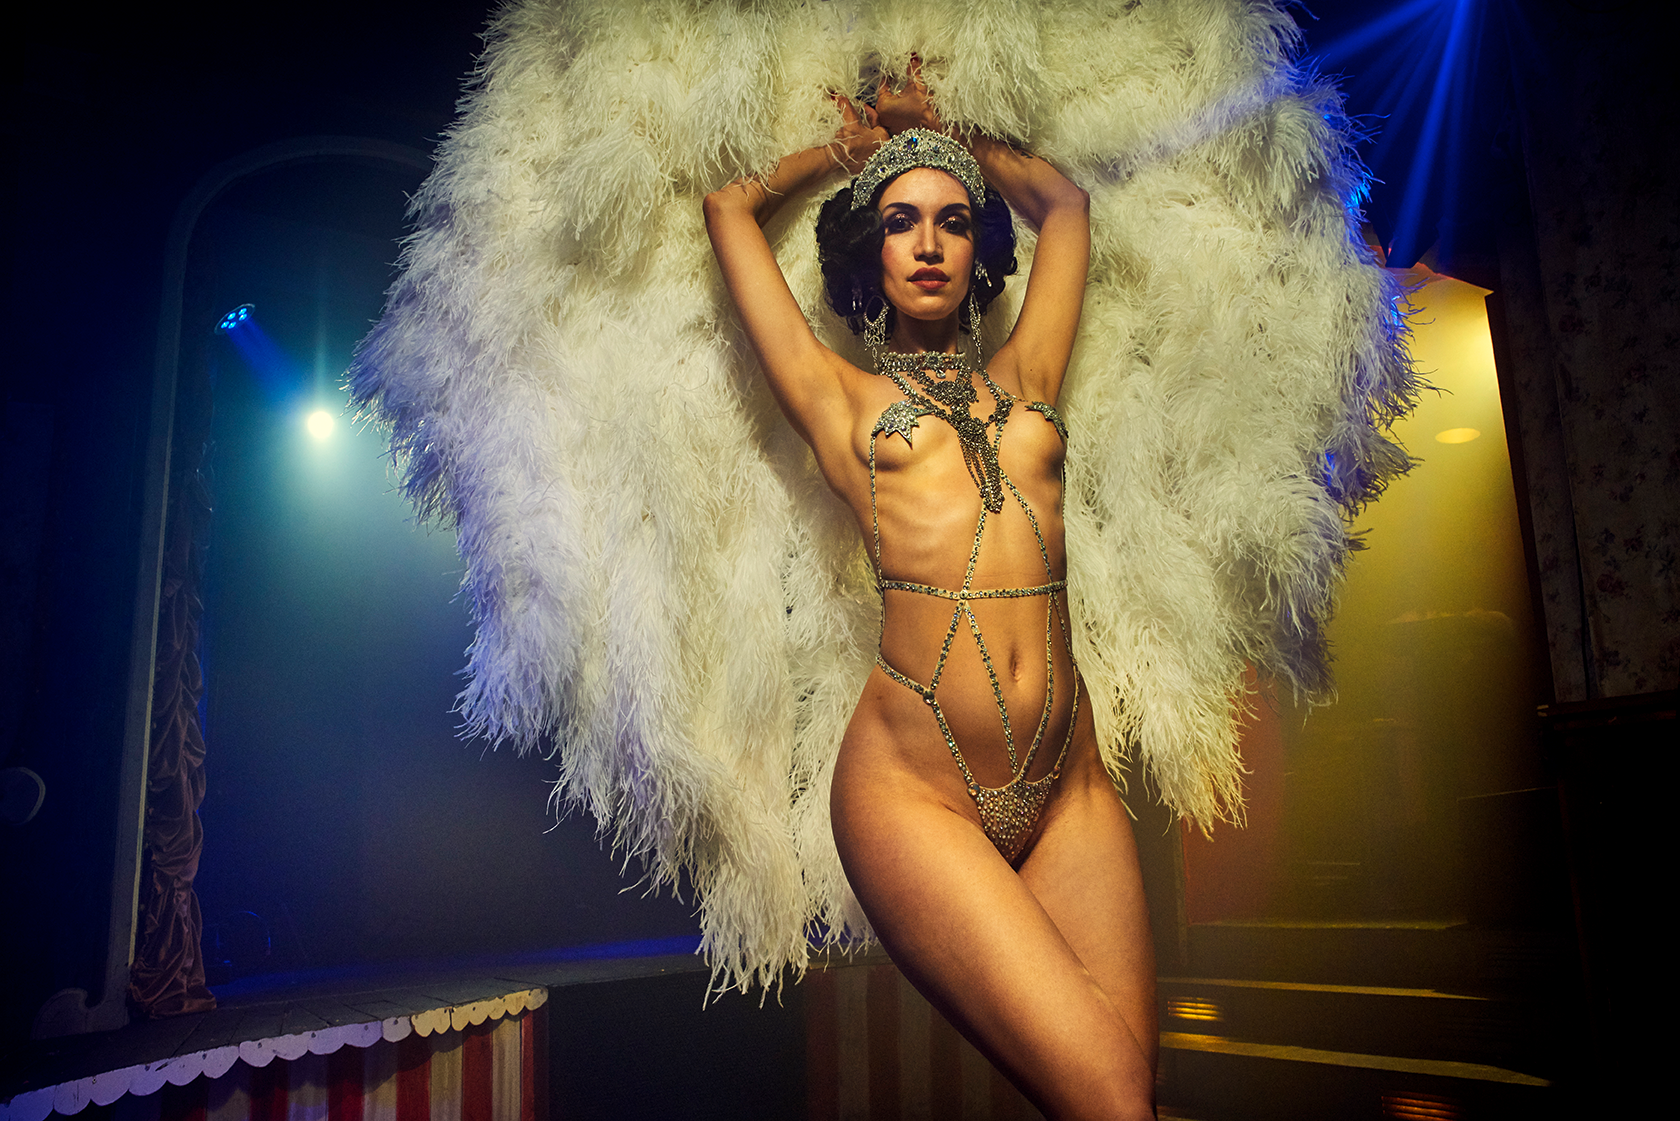 Künstleragentur-Burlesque-HeldIn-101-Subhead-Bild-4-Sedcard-Heroine-Artists